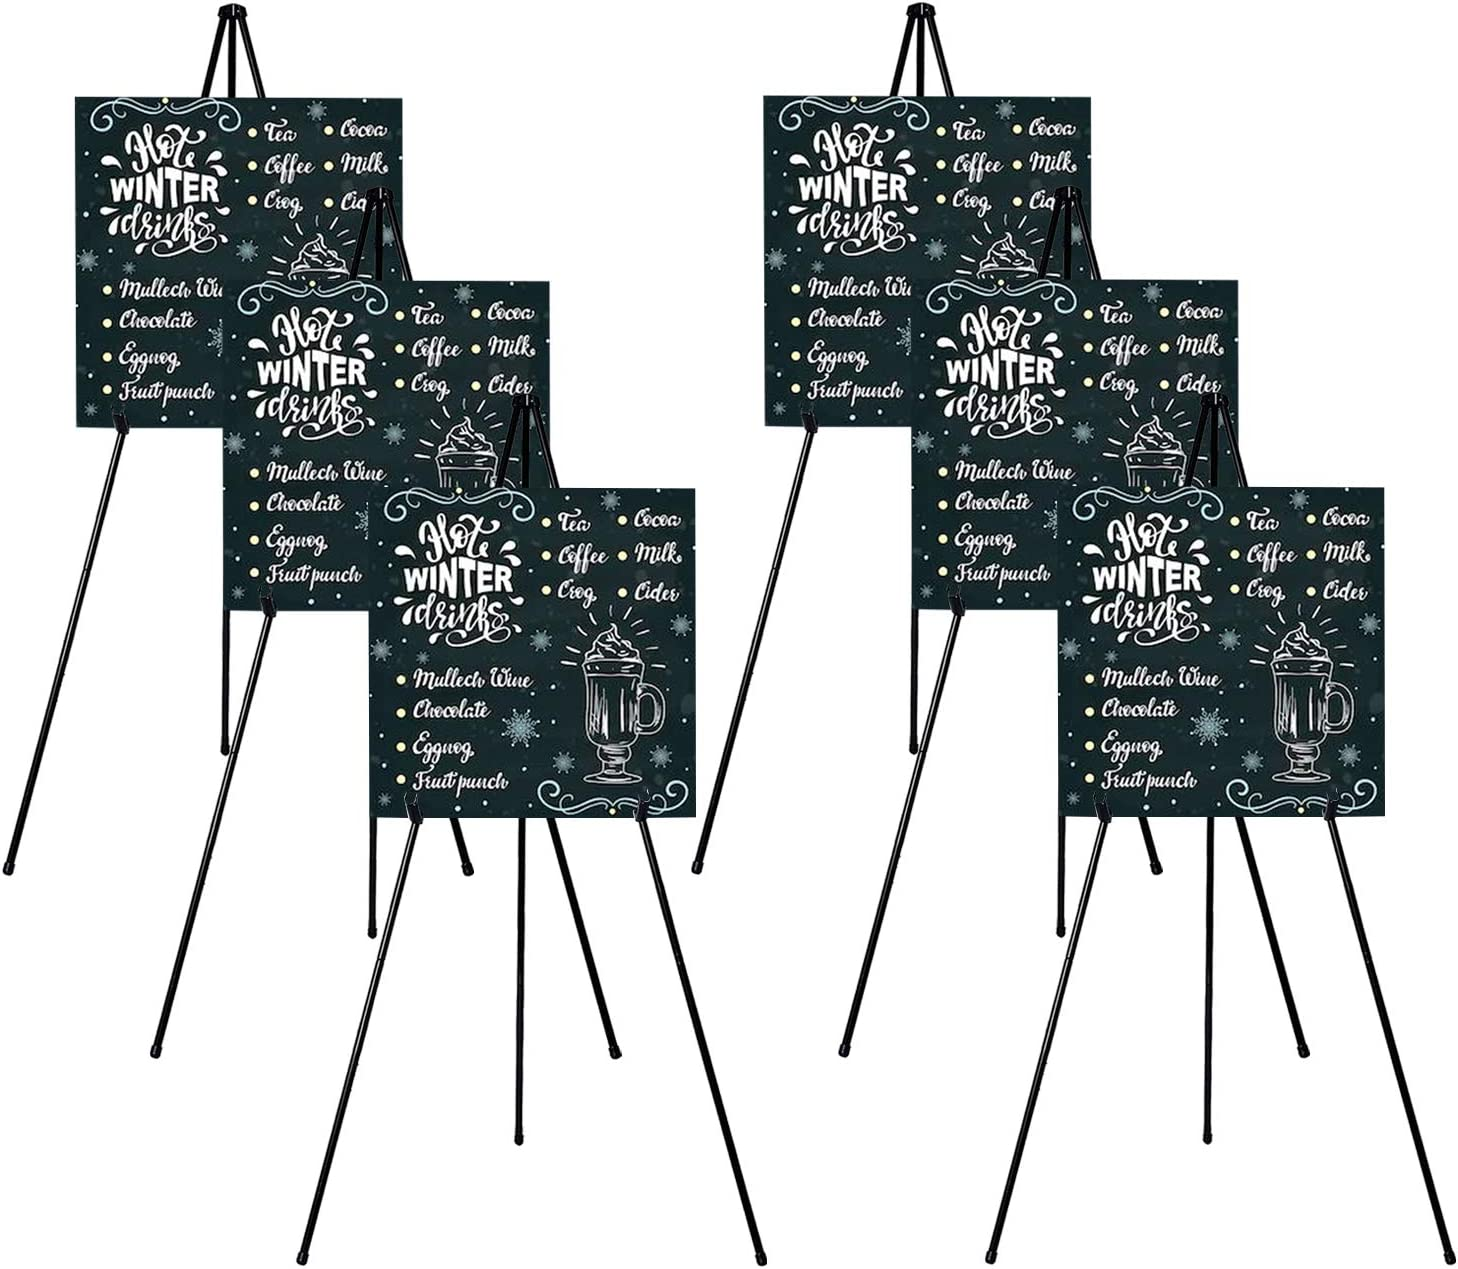 Folding Easel for Display Popular Overseas parallel import regular item Portable St Floor Easy-Set-up Tripod